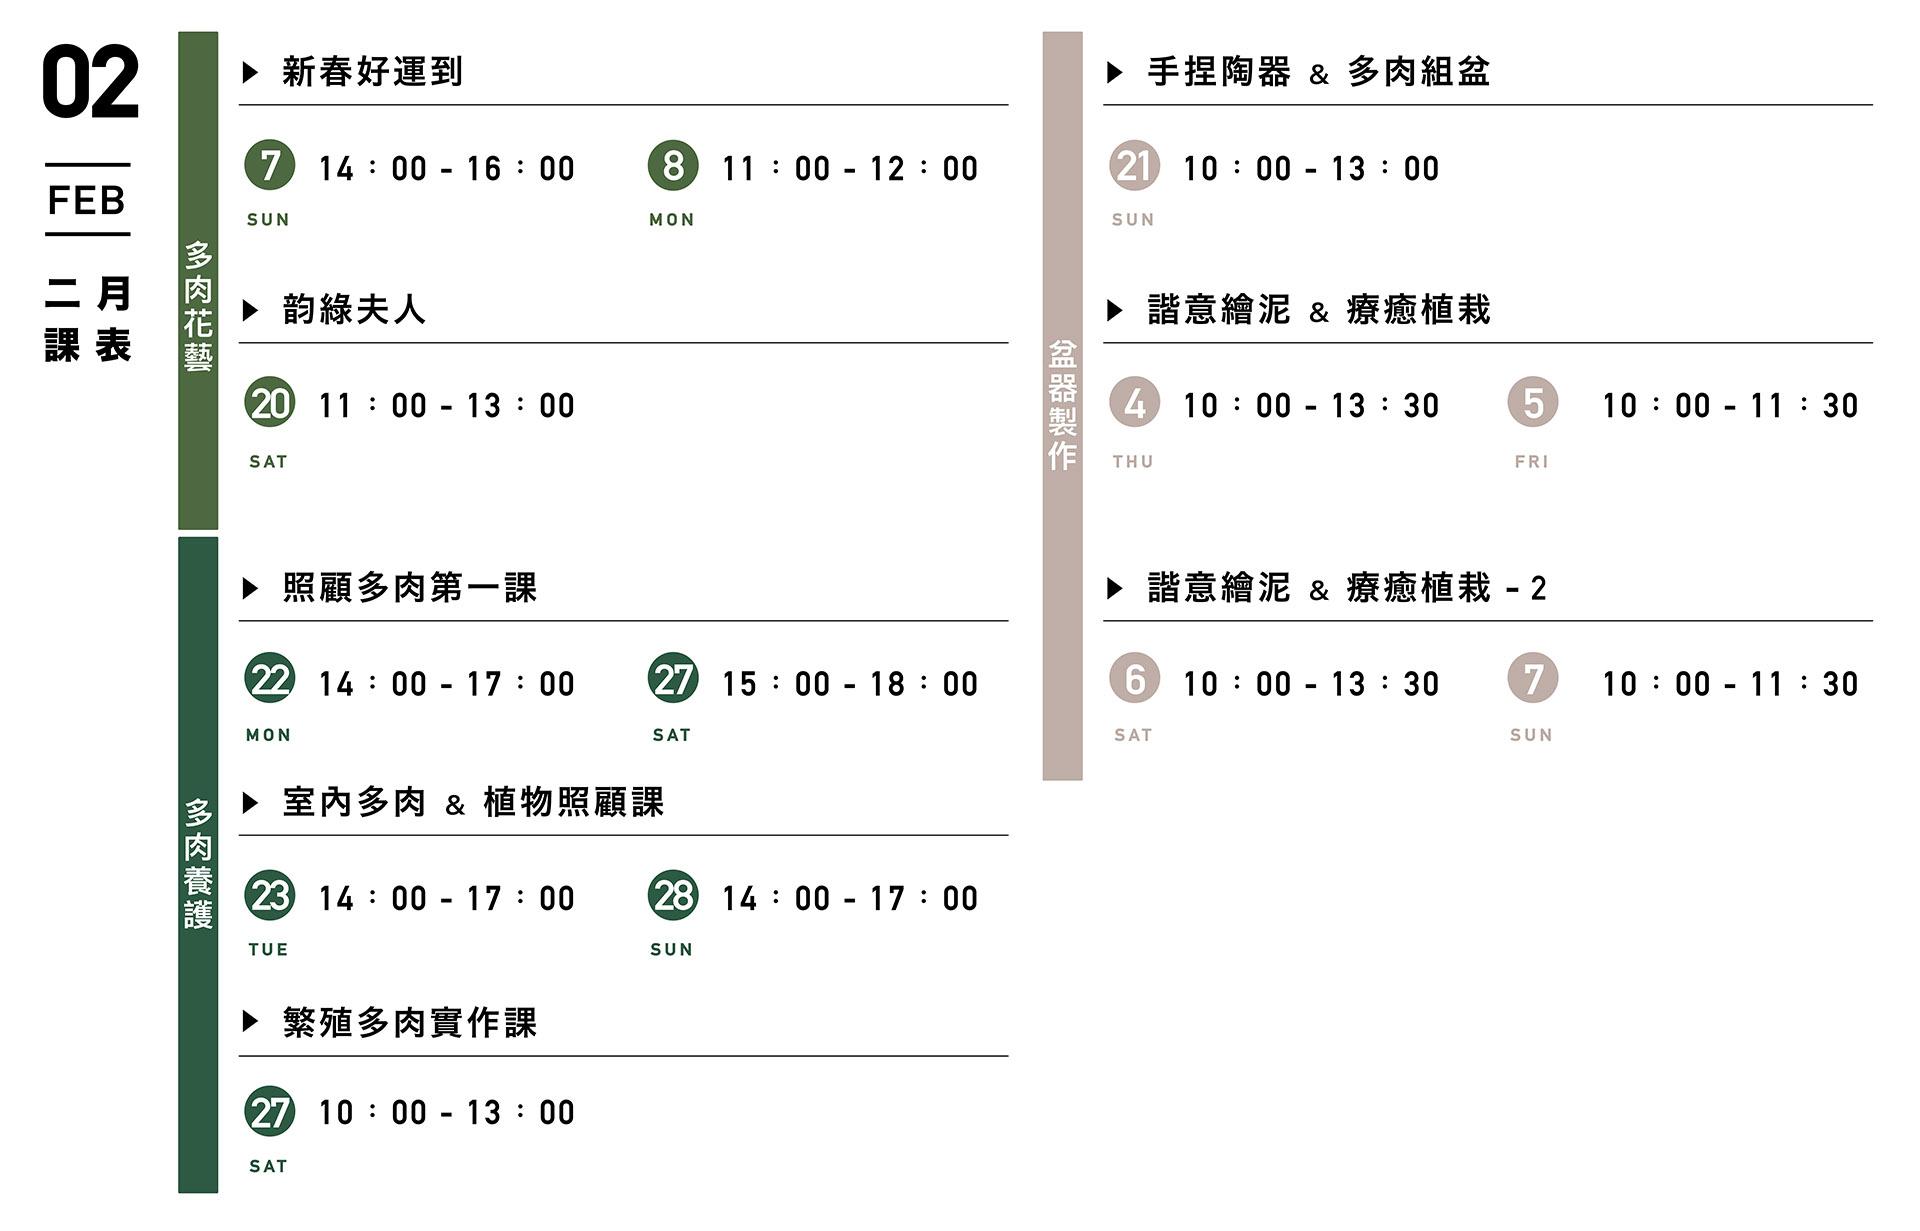 LESSON 2月課表 橫式 工作區域 1